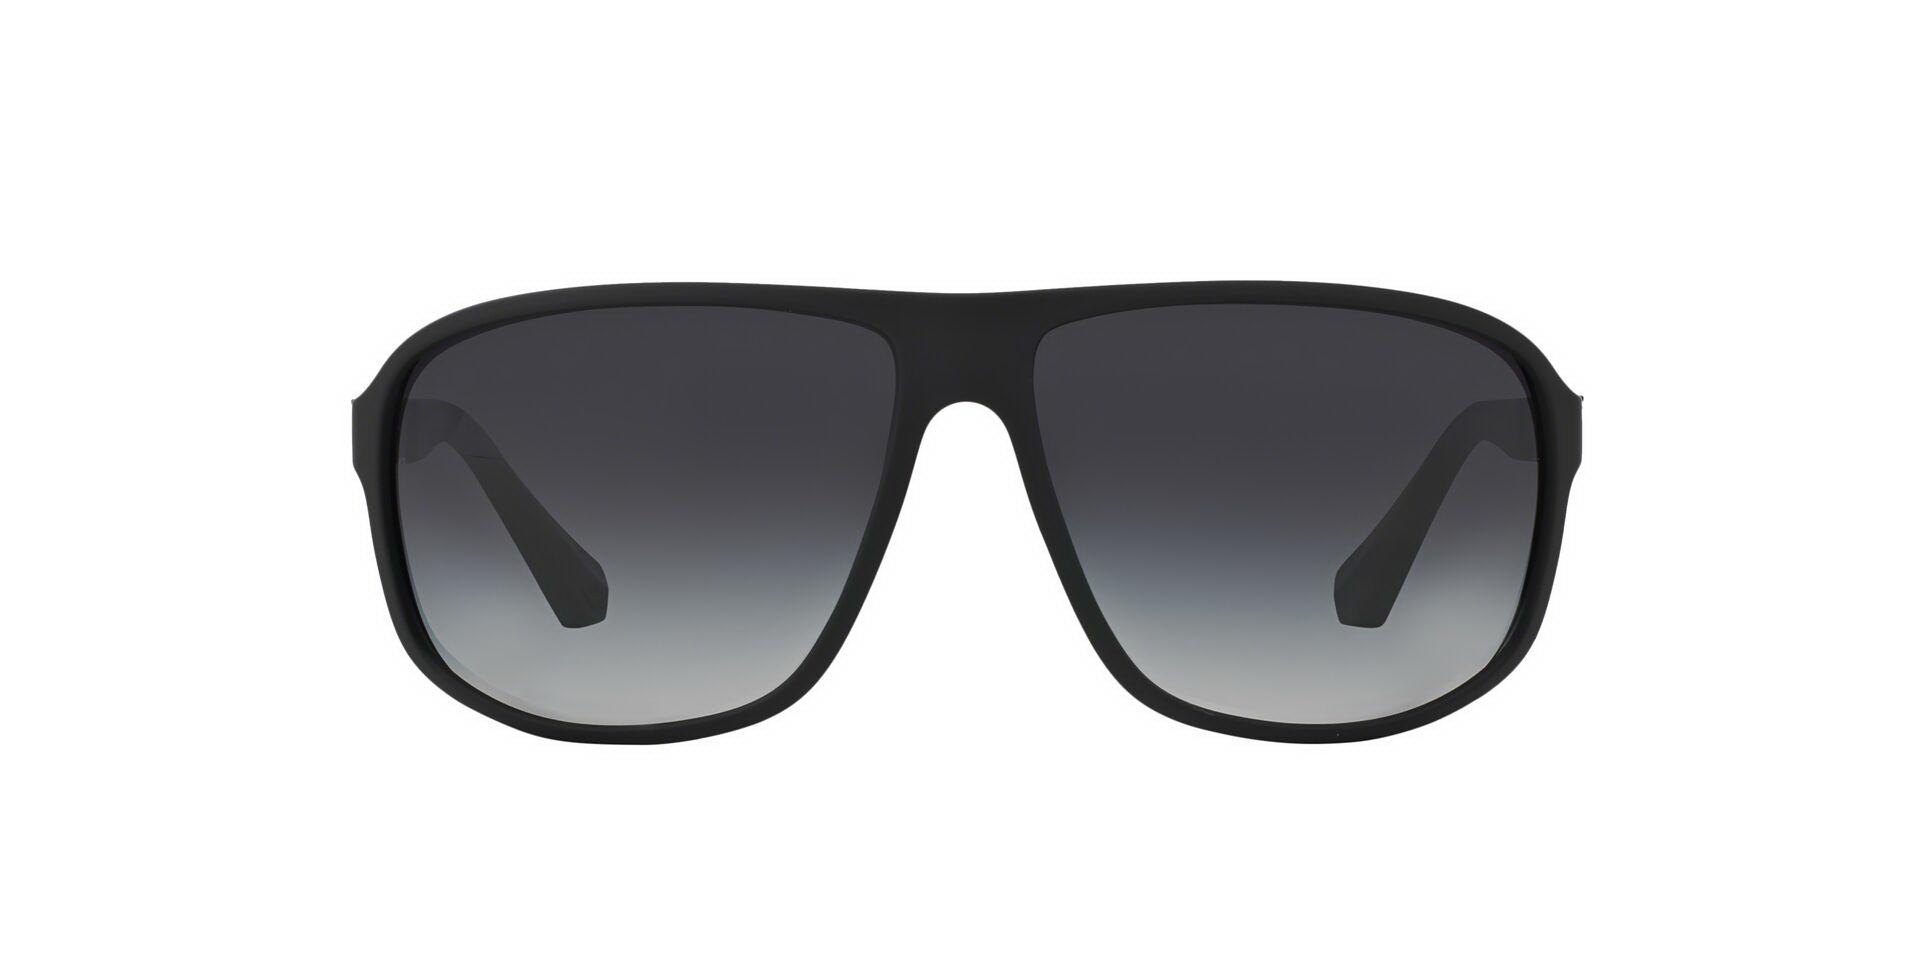 Солнцезащитные очки Очки с/з Emporio Armani 0EA4029 50638G фото